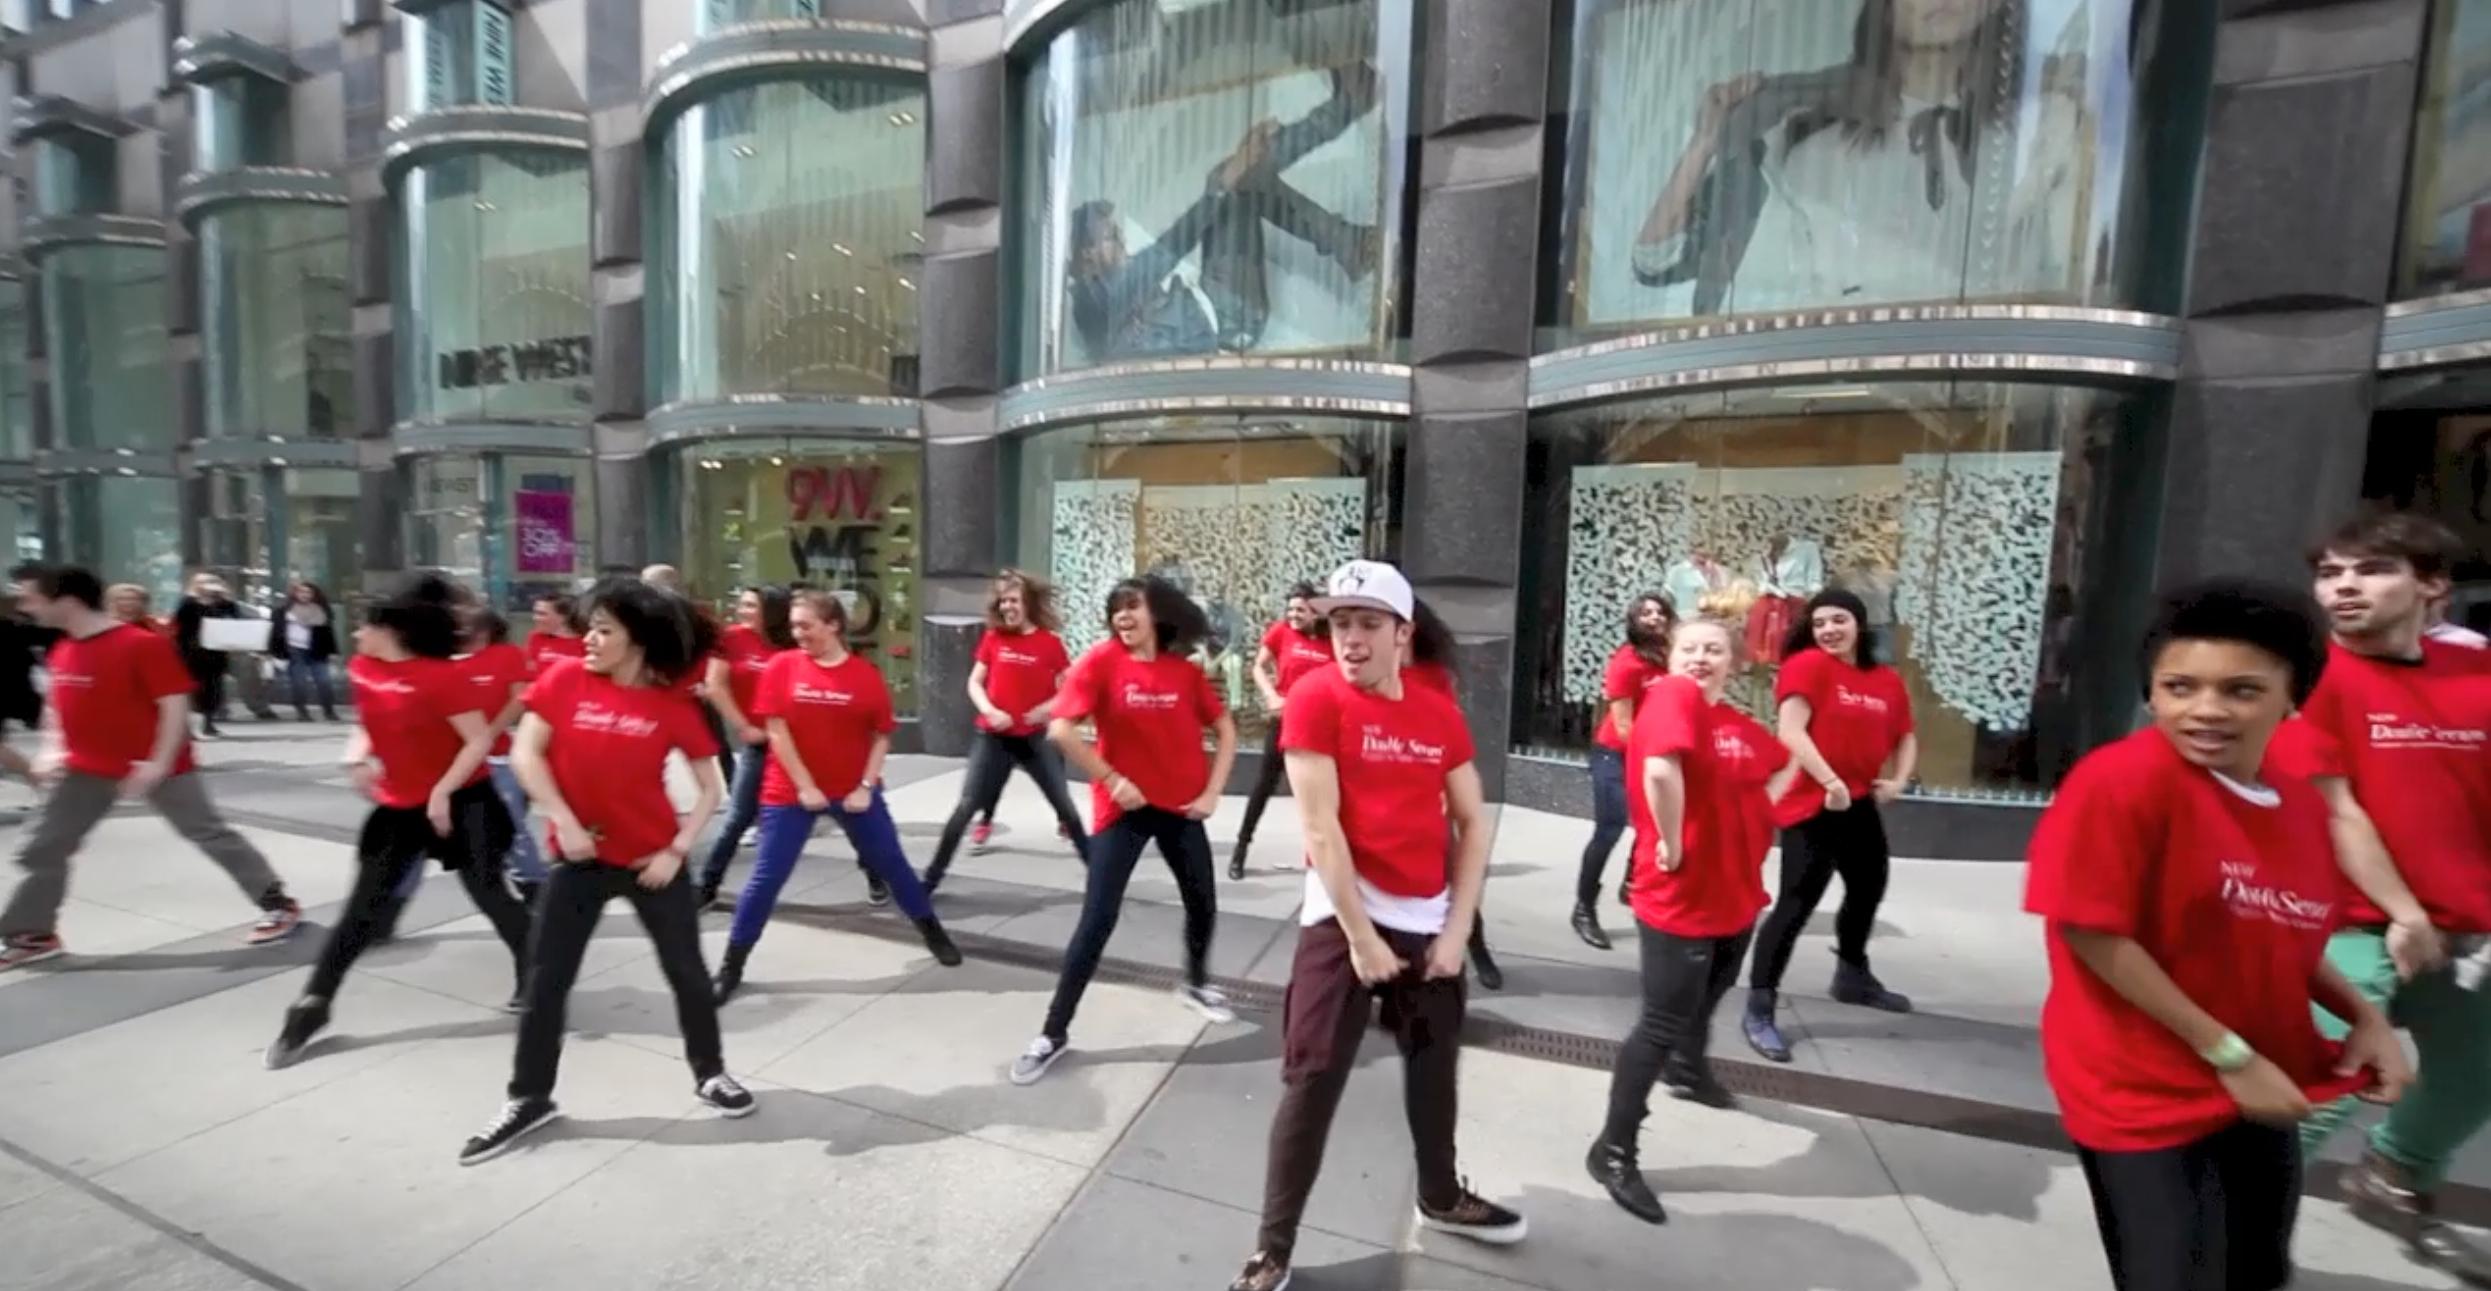 SHARE_2_-_BookAFlashMob.com_-_Clarins_Double_Serum_Campaign_Flash_Mob_at_Bloomingdales_-_NYC-_6